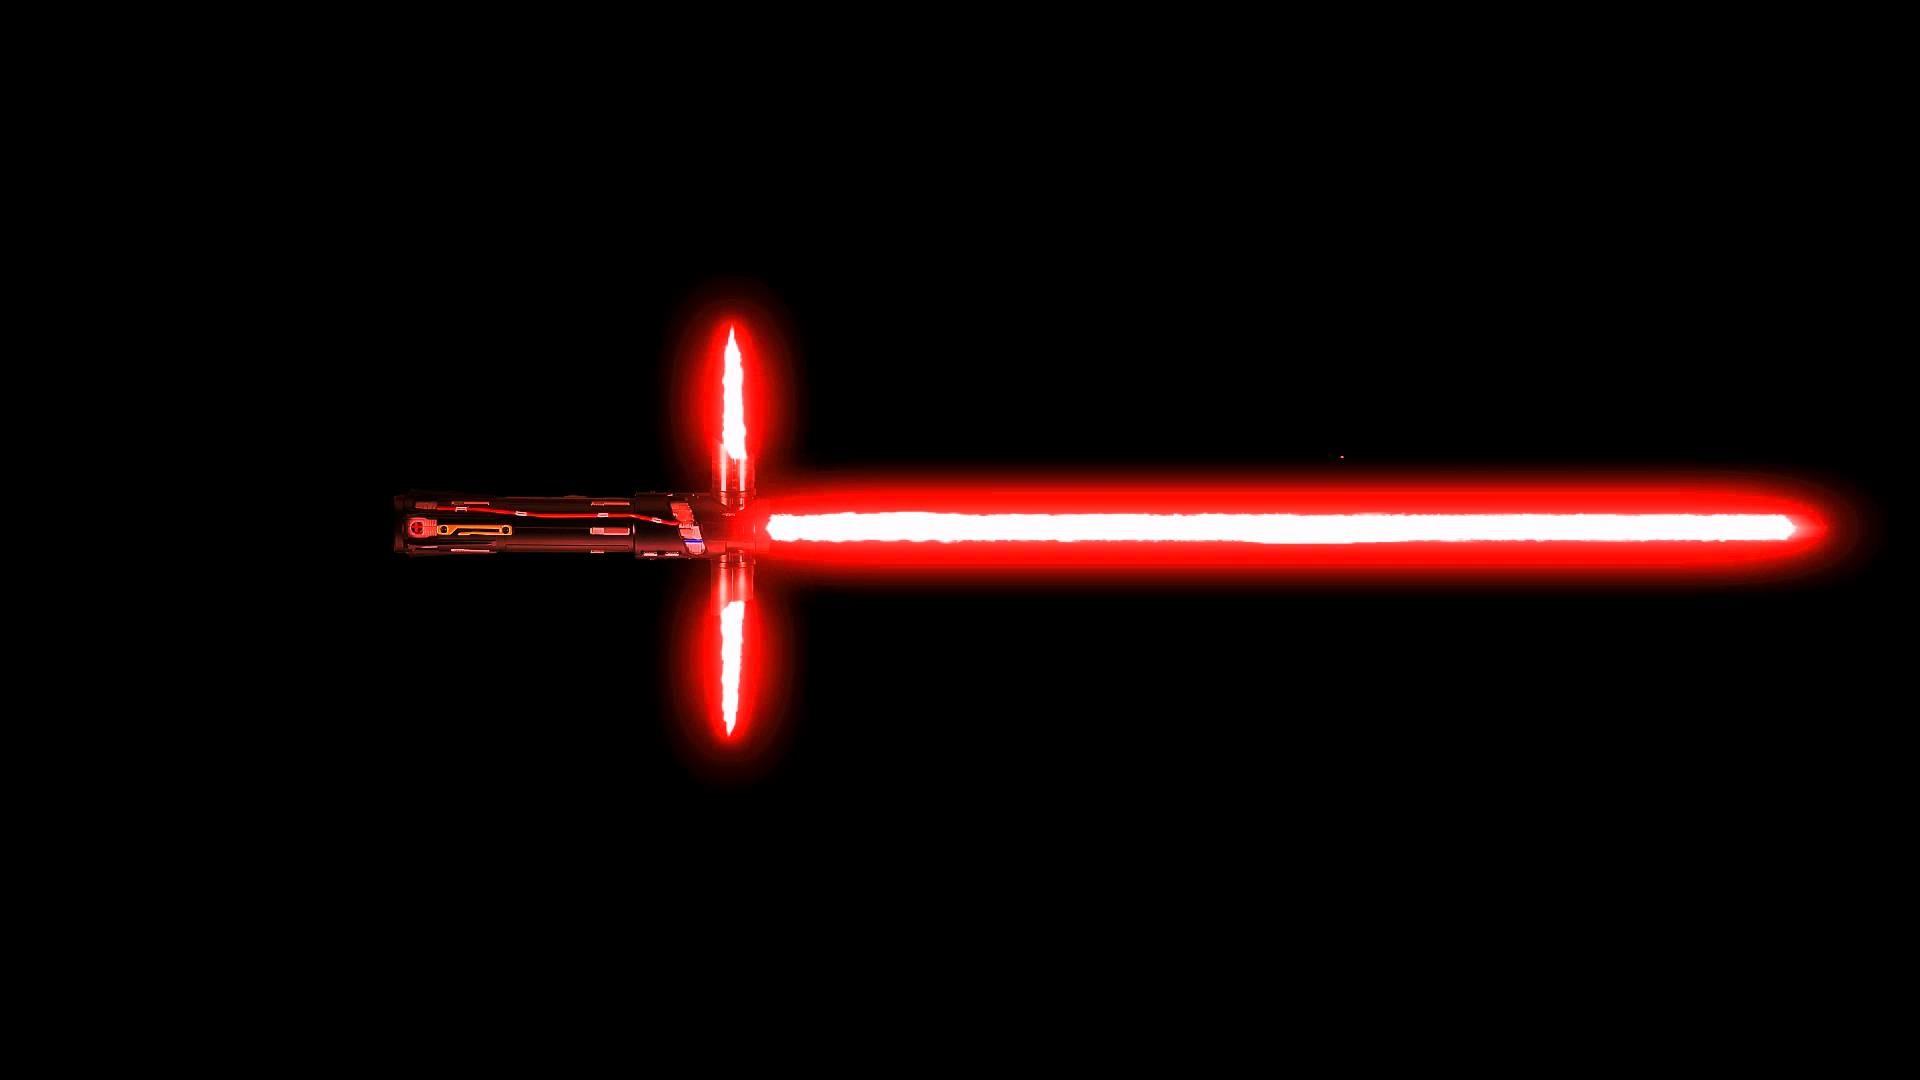 Kylo Ren style Lightsaber Effect Test